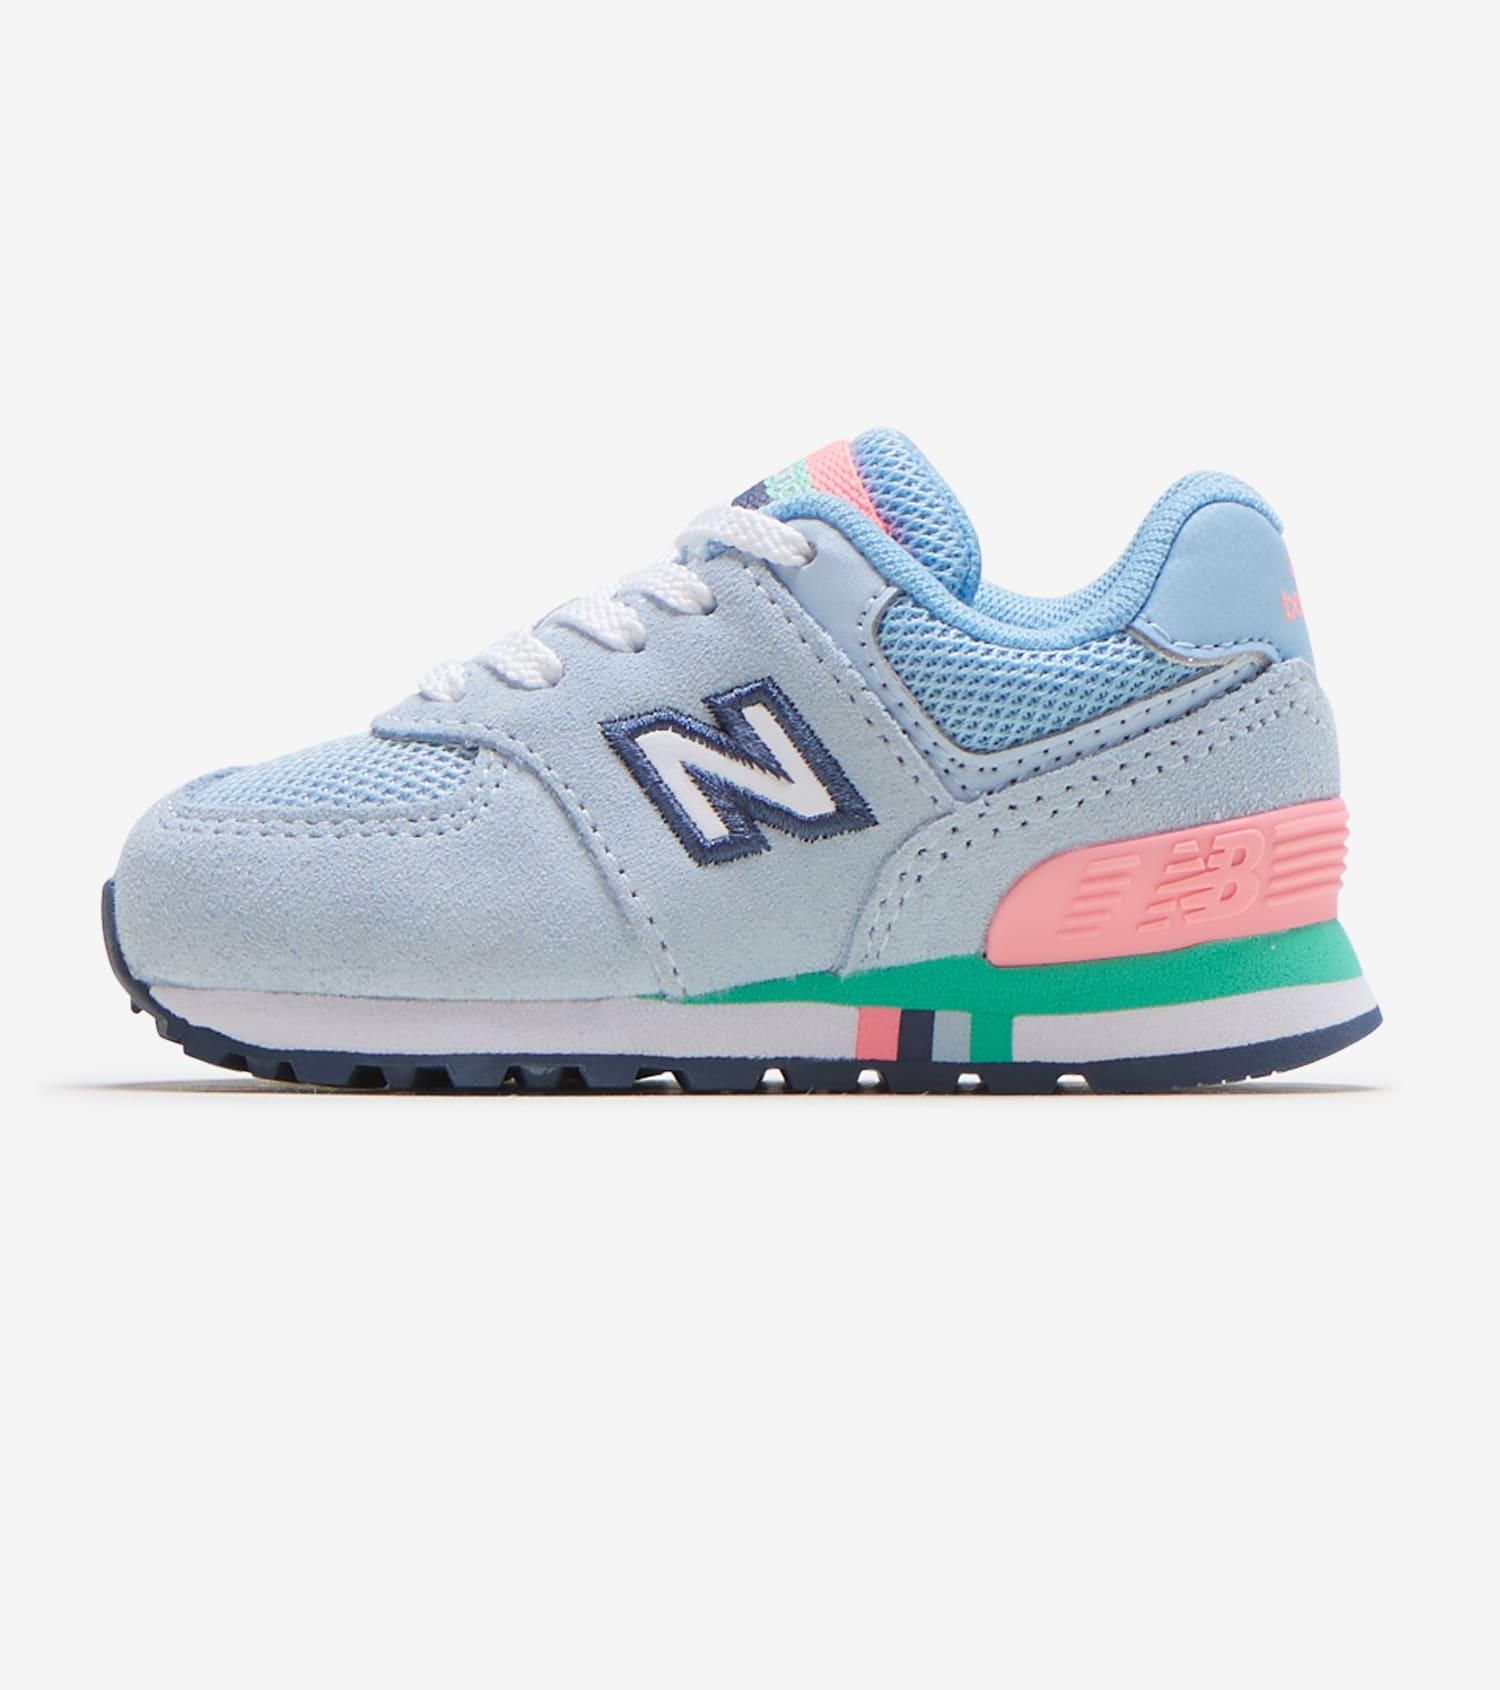 huge discount 16336 ba8a5 574 Lifestyle Shoe